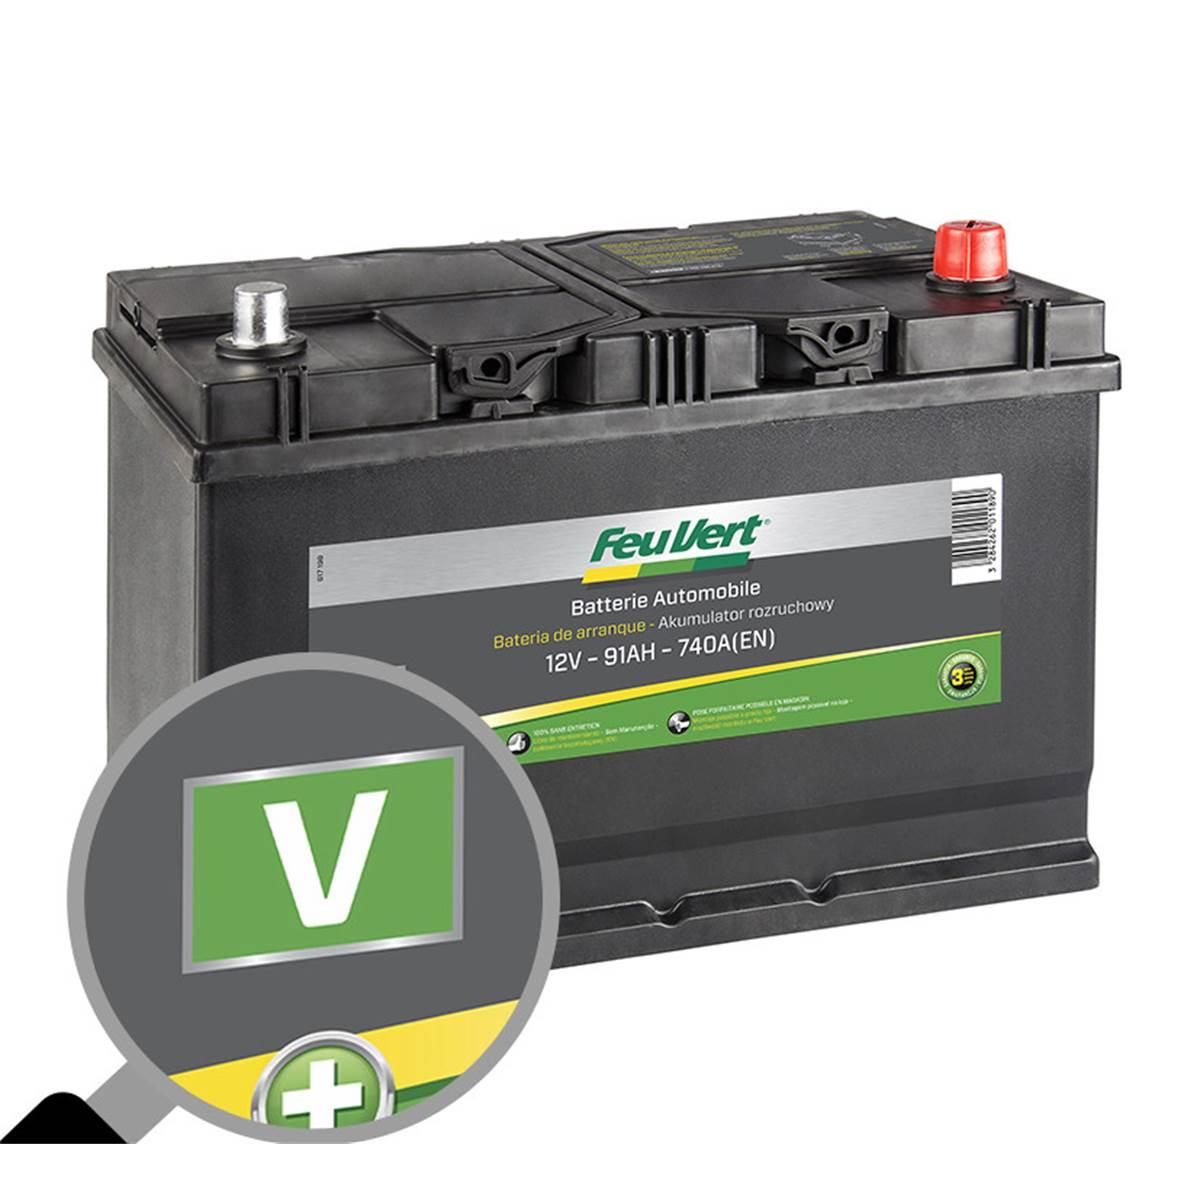 Batterie voiture Feu Vert V